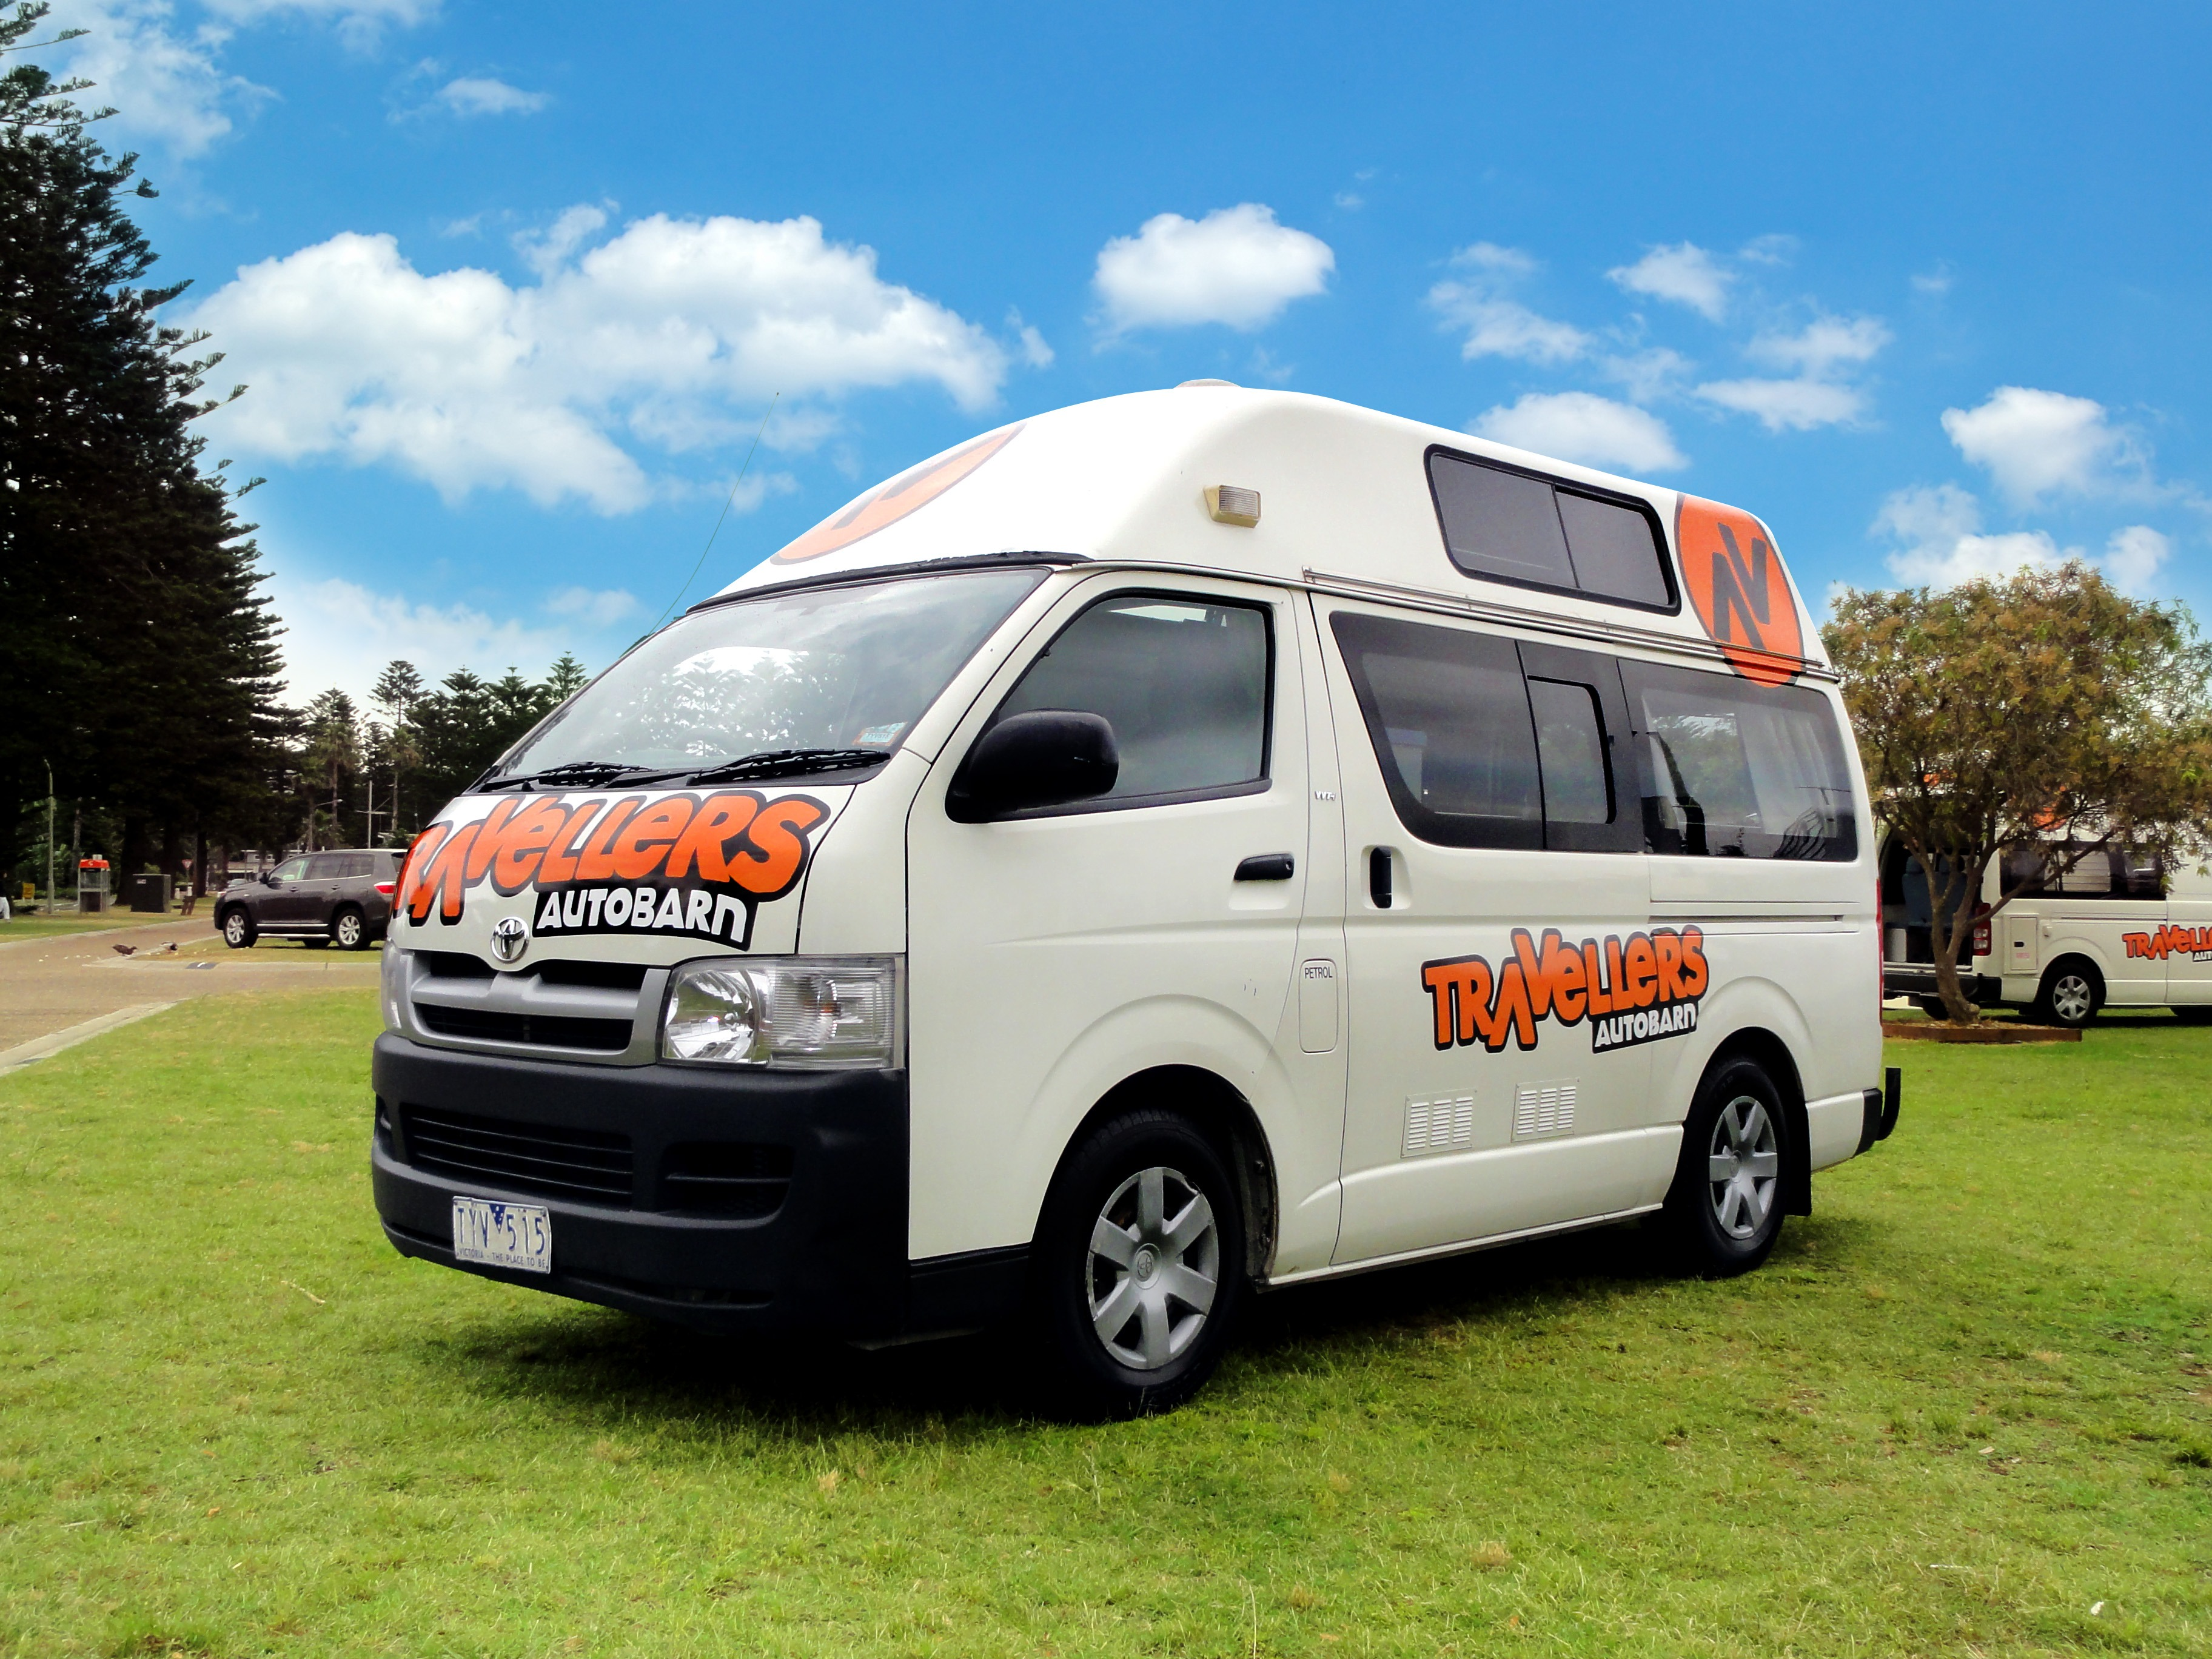 2016 Camper Van >> Hitop Campervan Hire - Travellers Autobarn EN